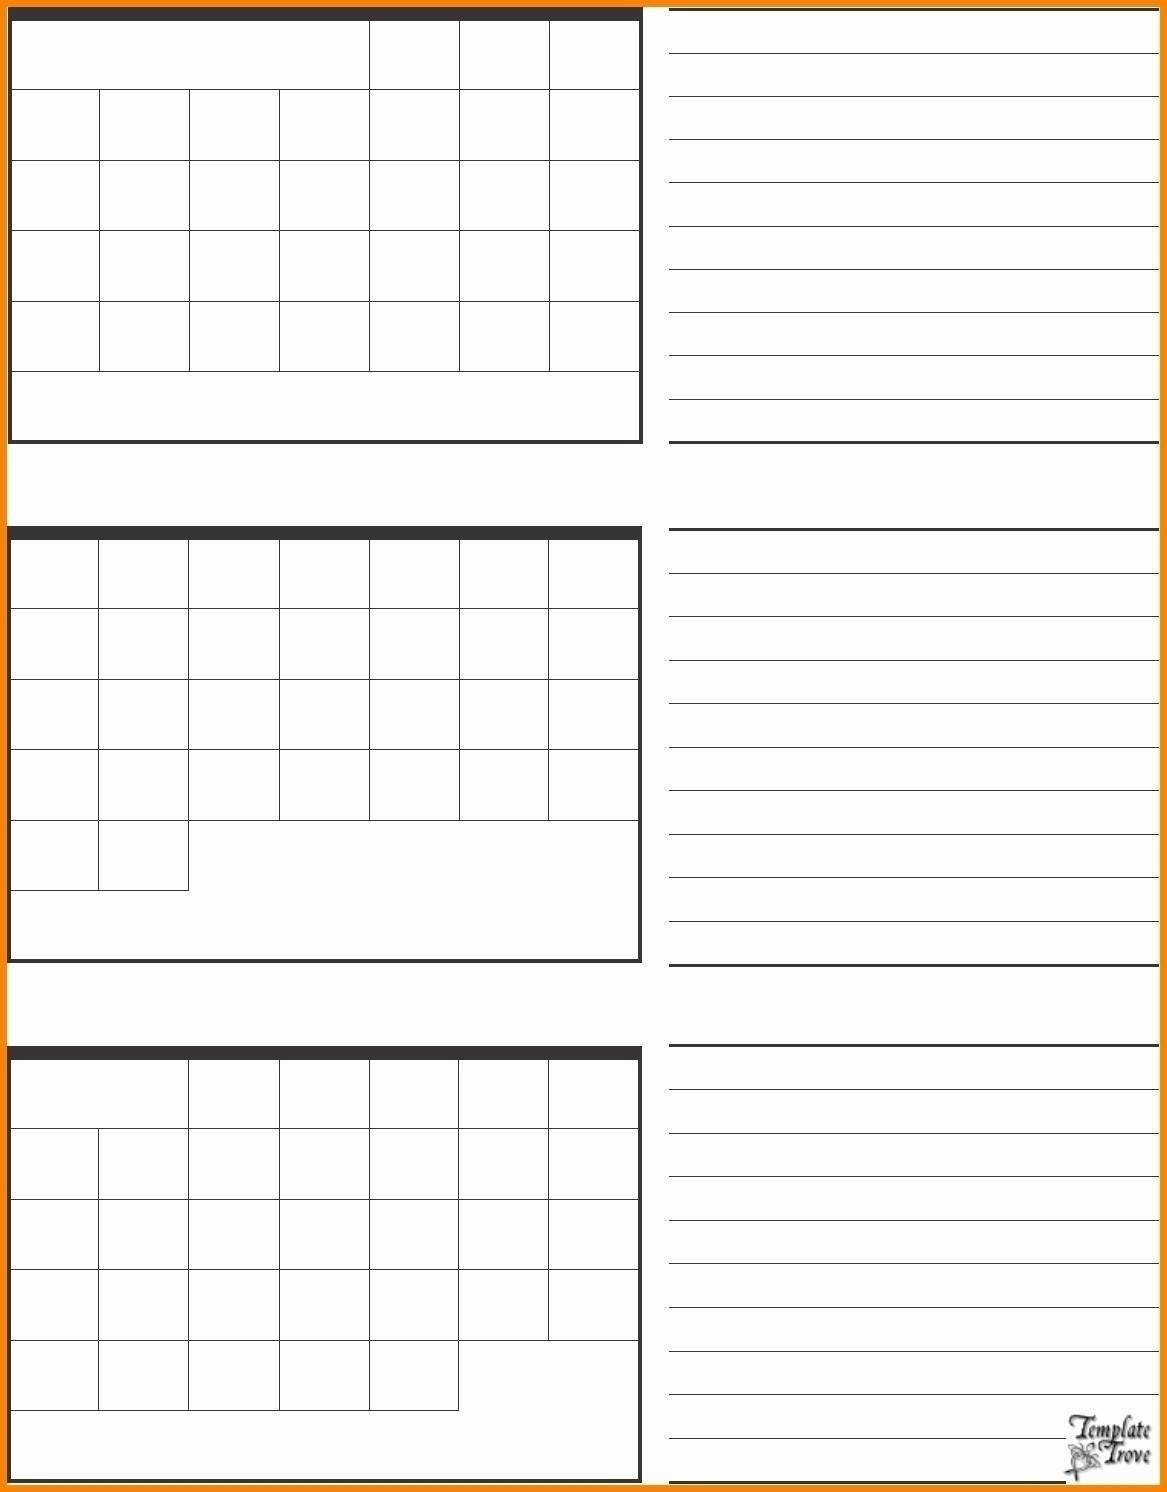 3 Month Blank Printable   Calendar Template Printable throughout Blank 3 Month Calendar